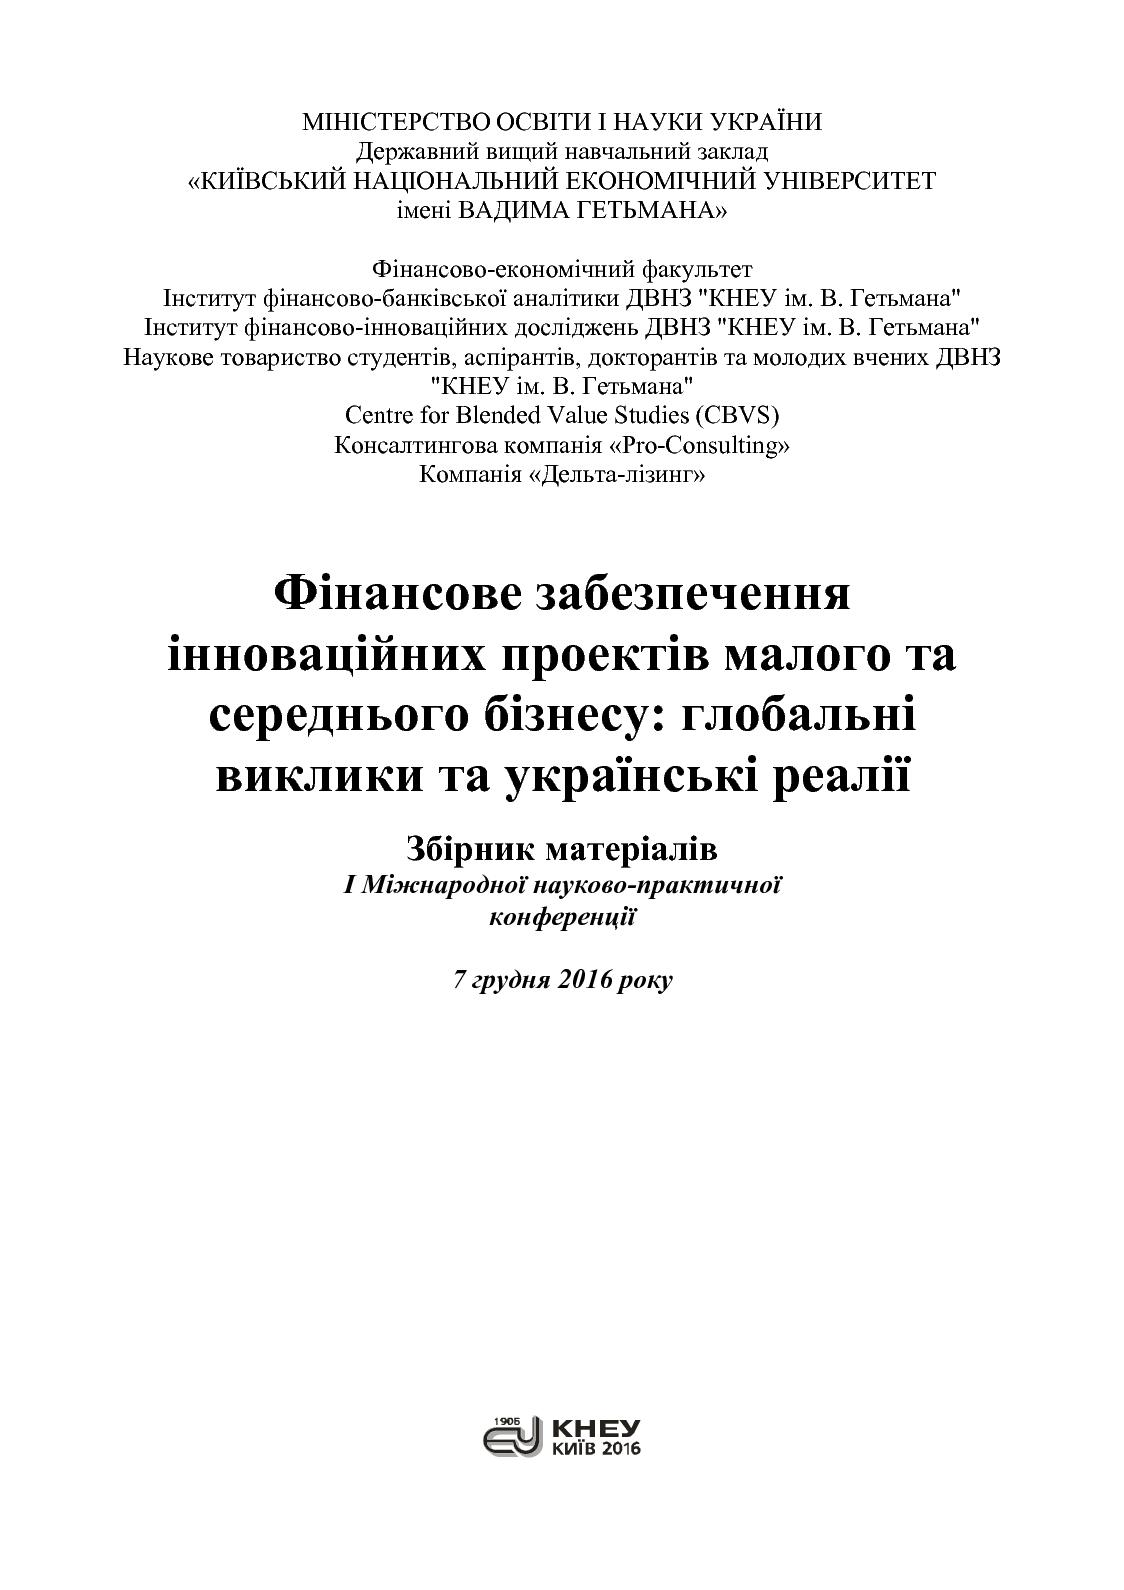 Calaméo - Брітченко І.Г. 2e2a654181642